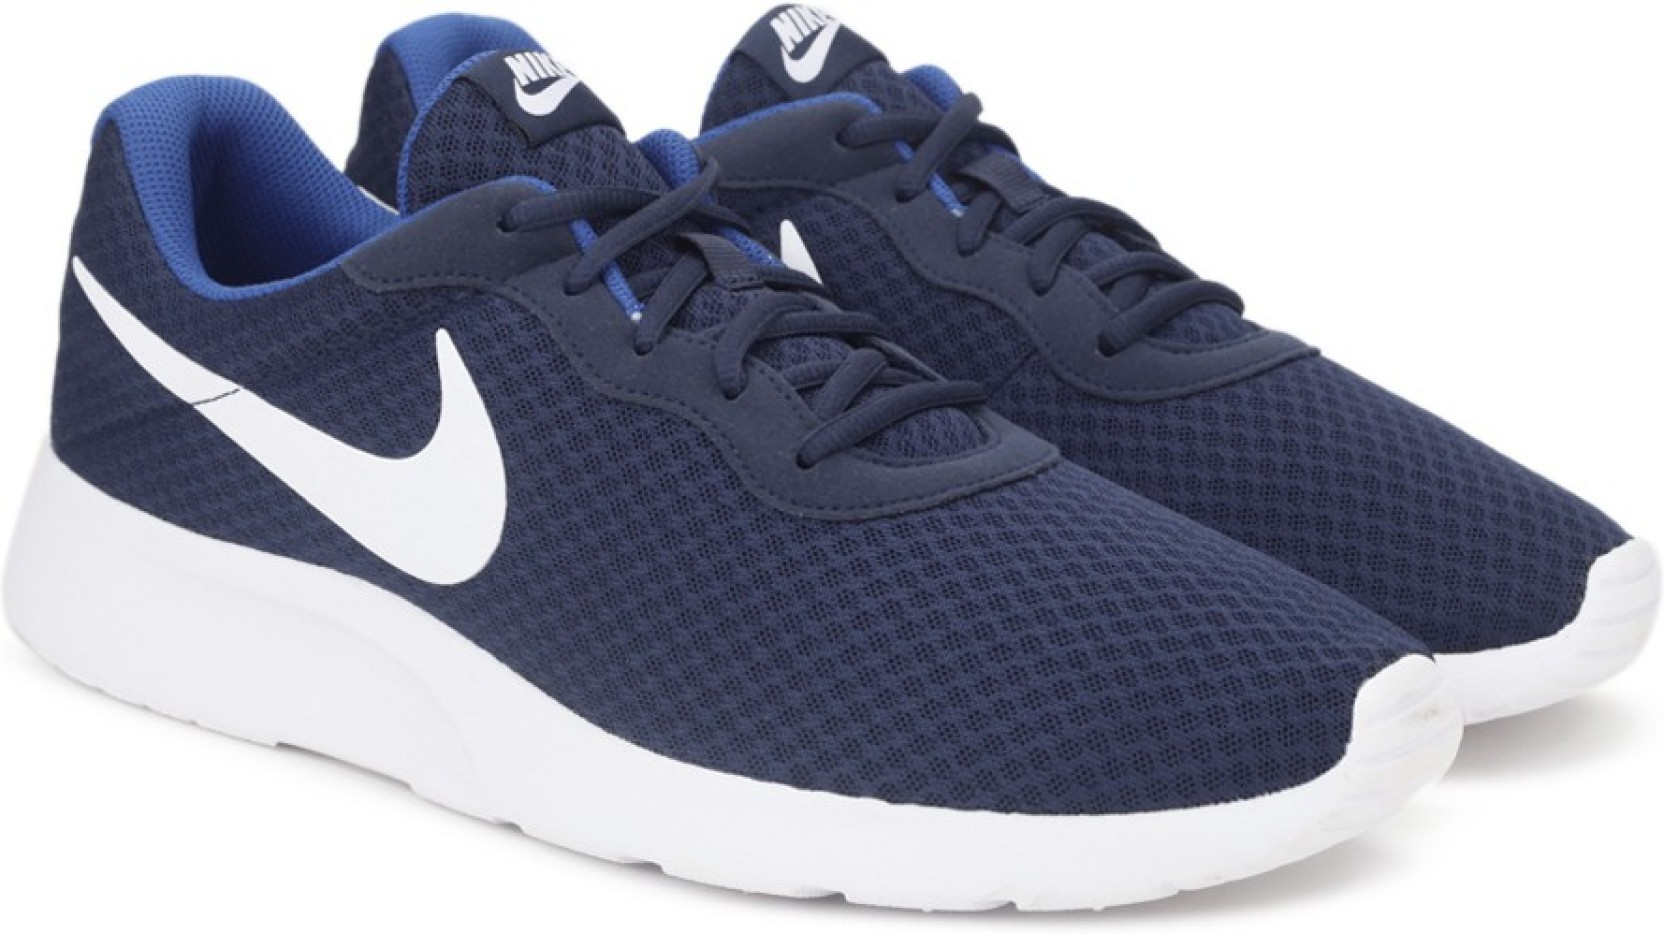 Nike Shoes Sneakers Flipkart